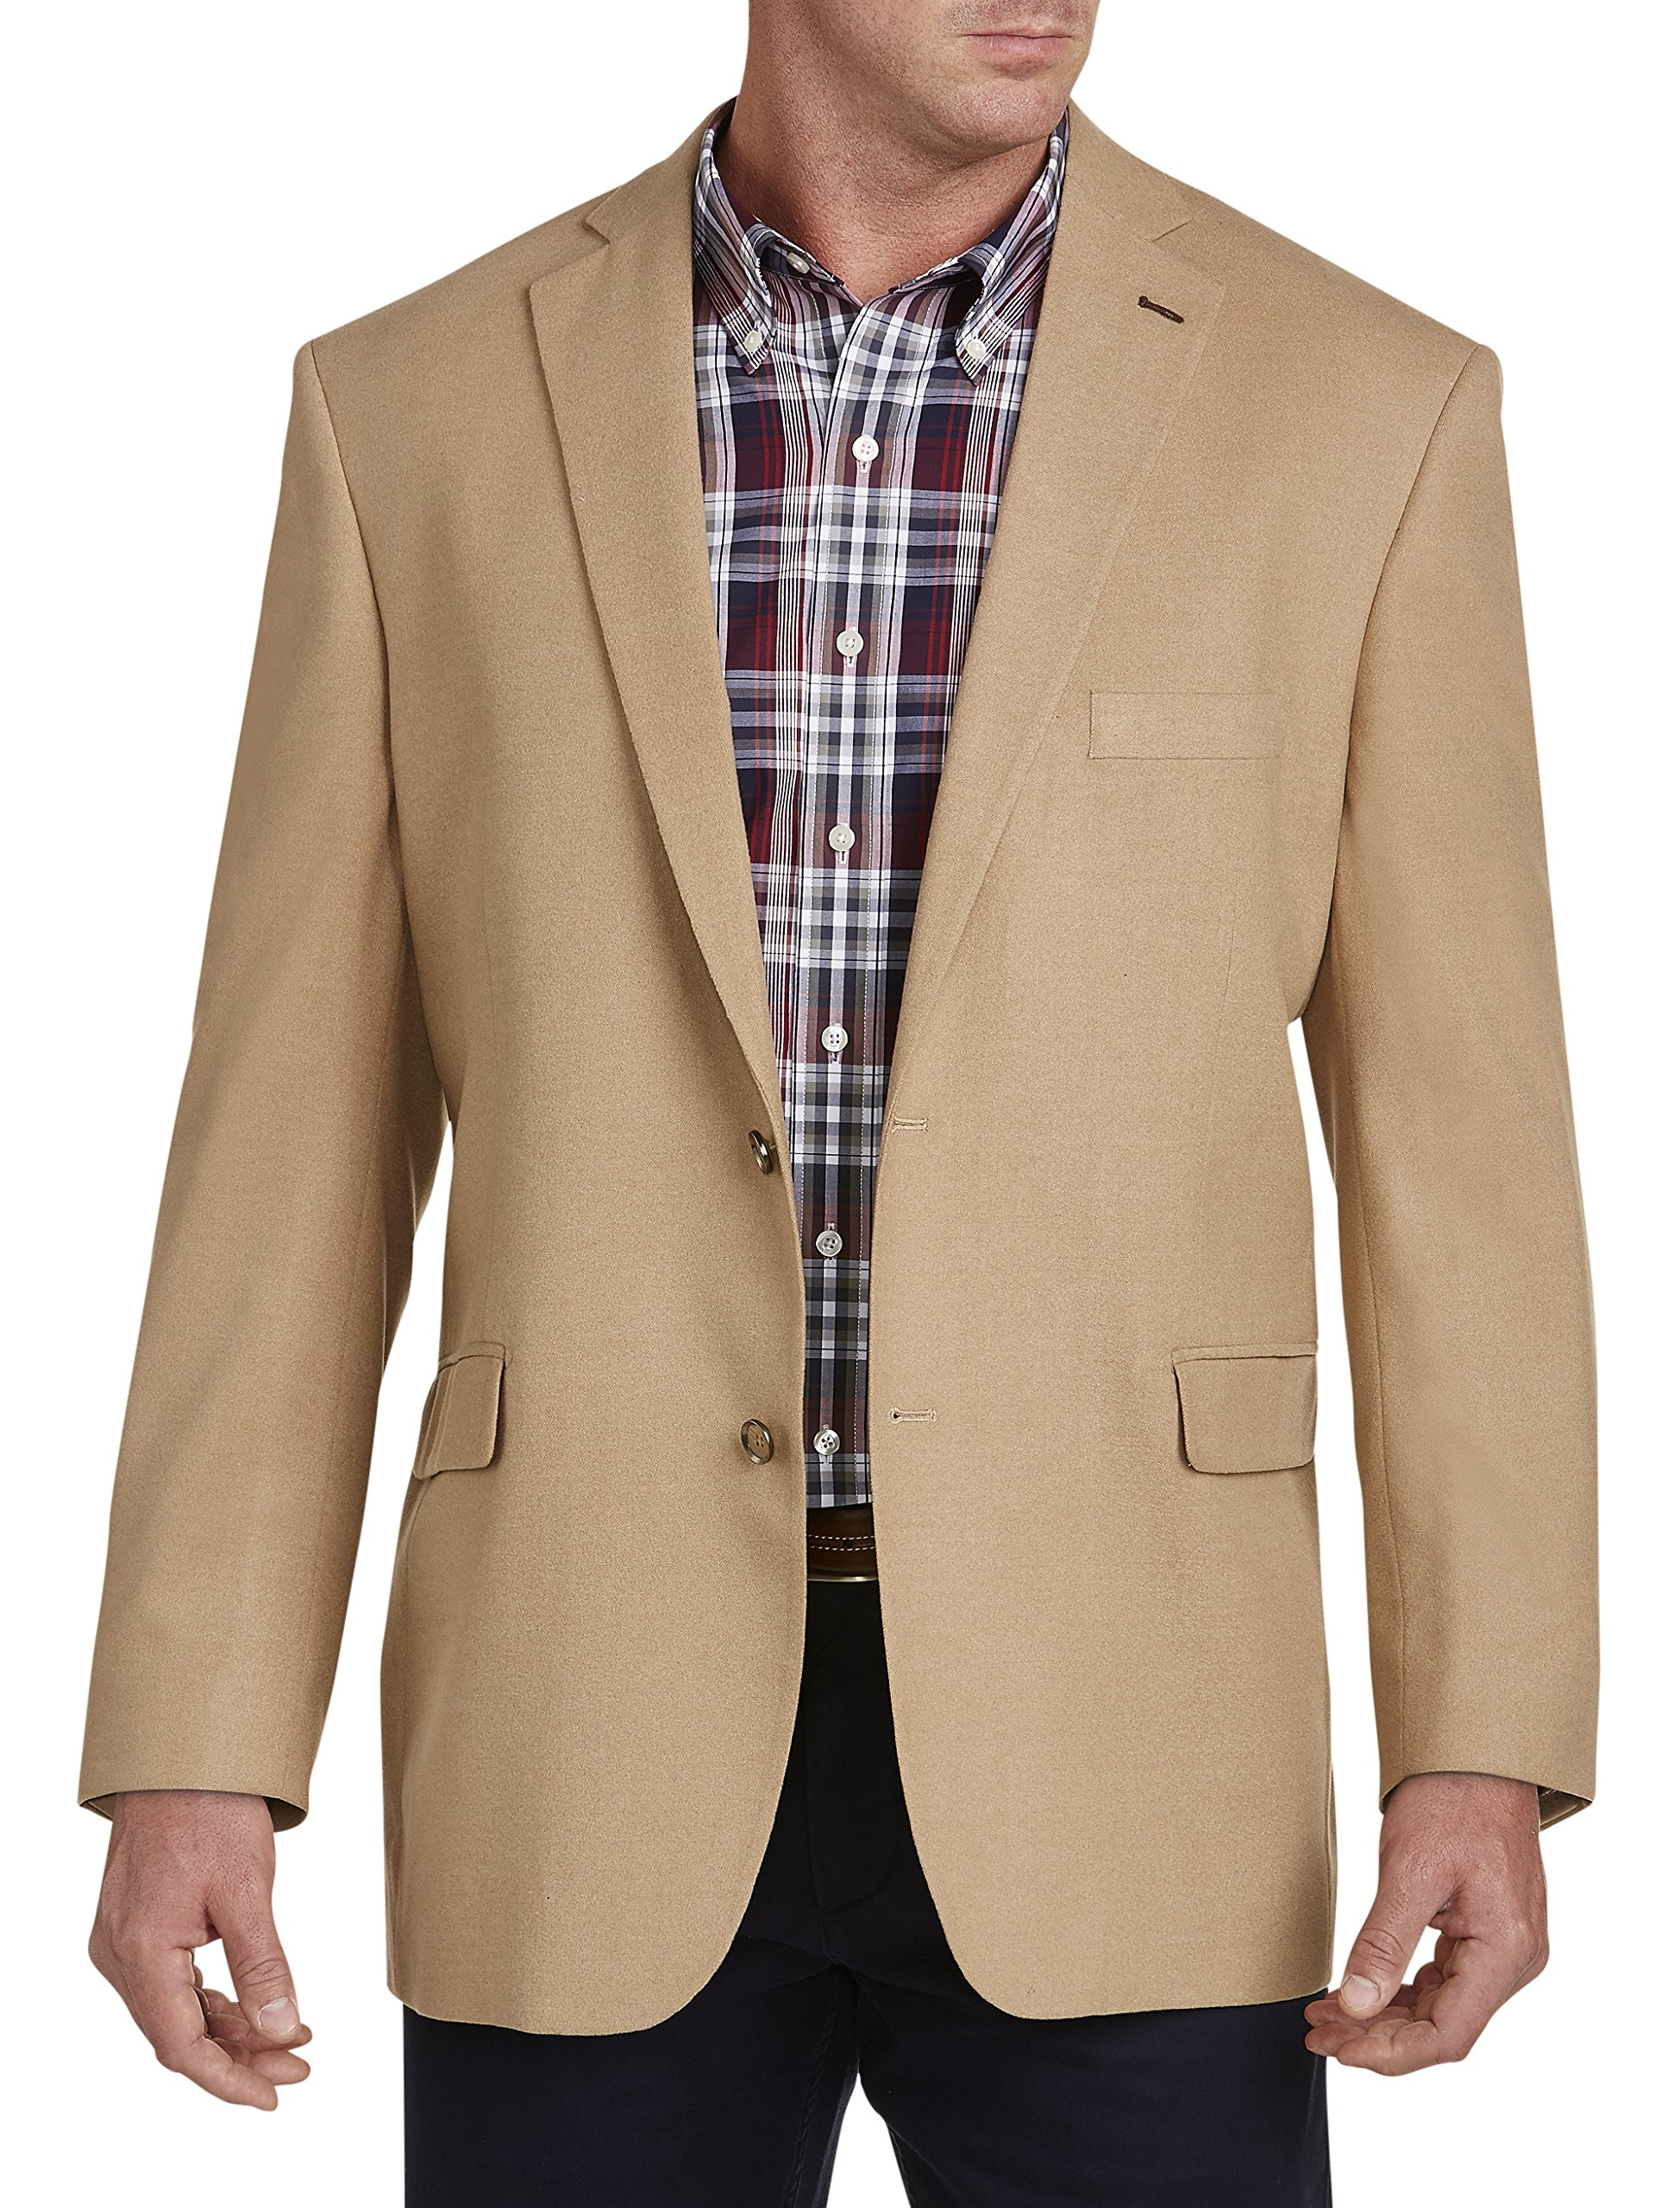 Oak Hill DXL Big and Tall Flannel Jacket Relaxer Sport Coat, Camel 4XL